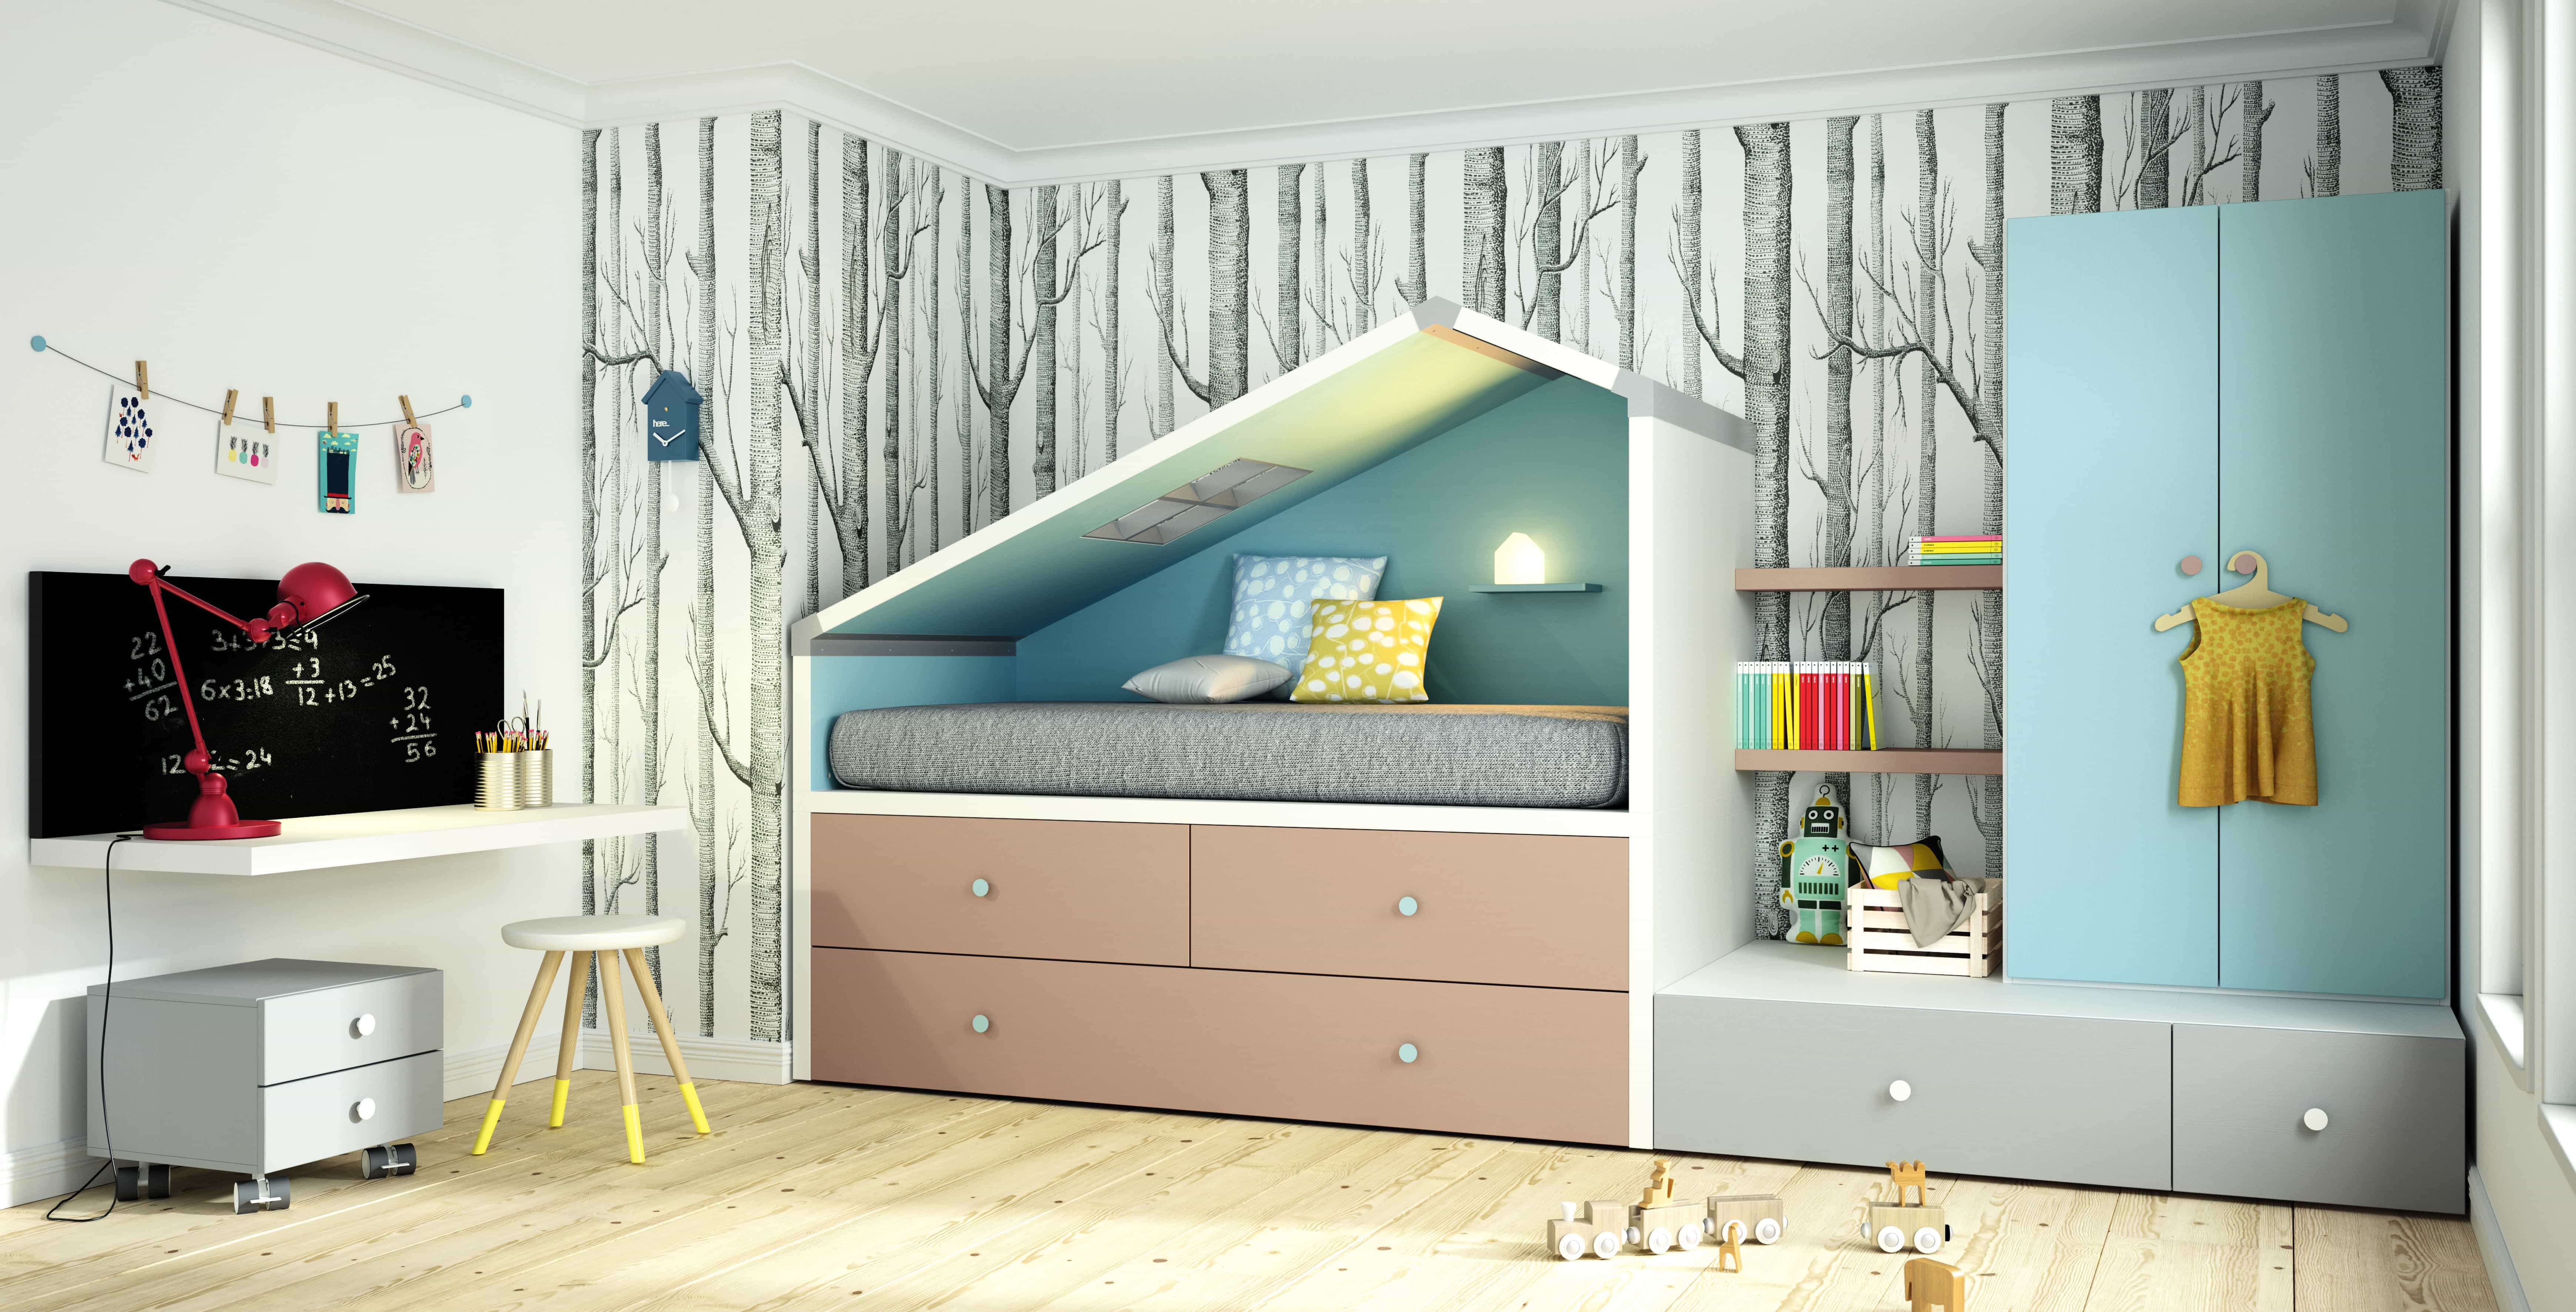 Camas nidos para dormitorios infantiles y juveniles - Camas tren para ninos ...